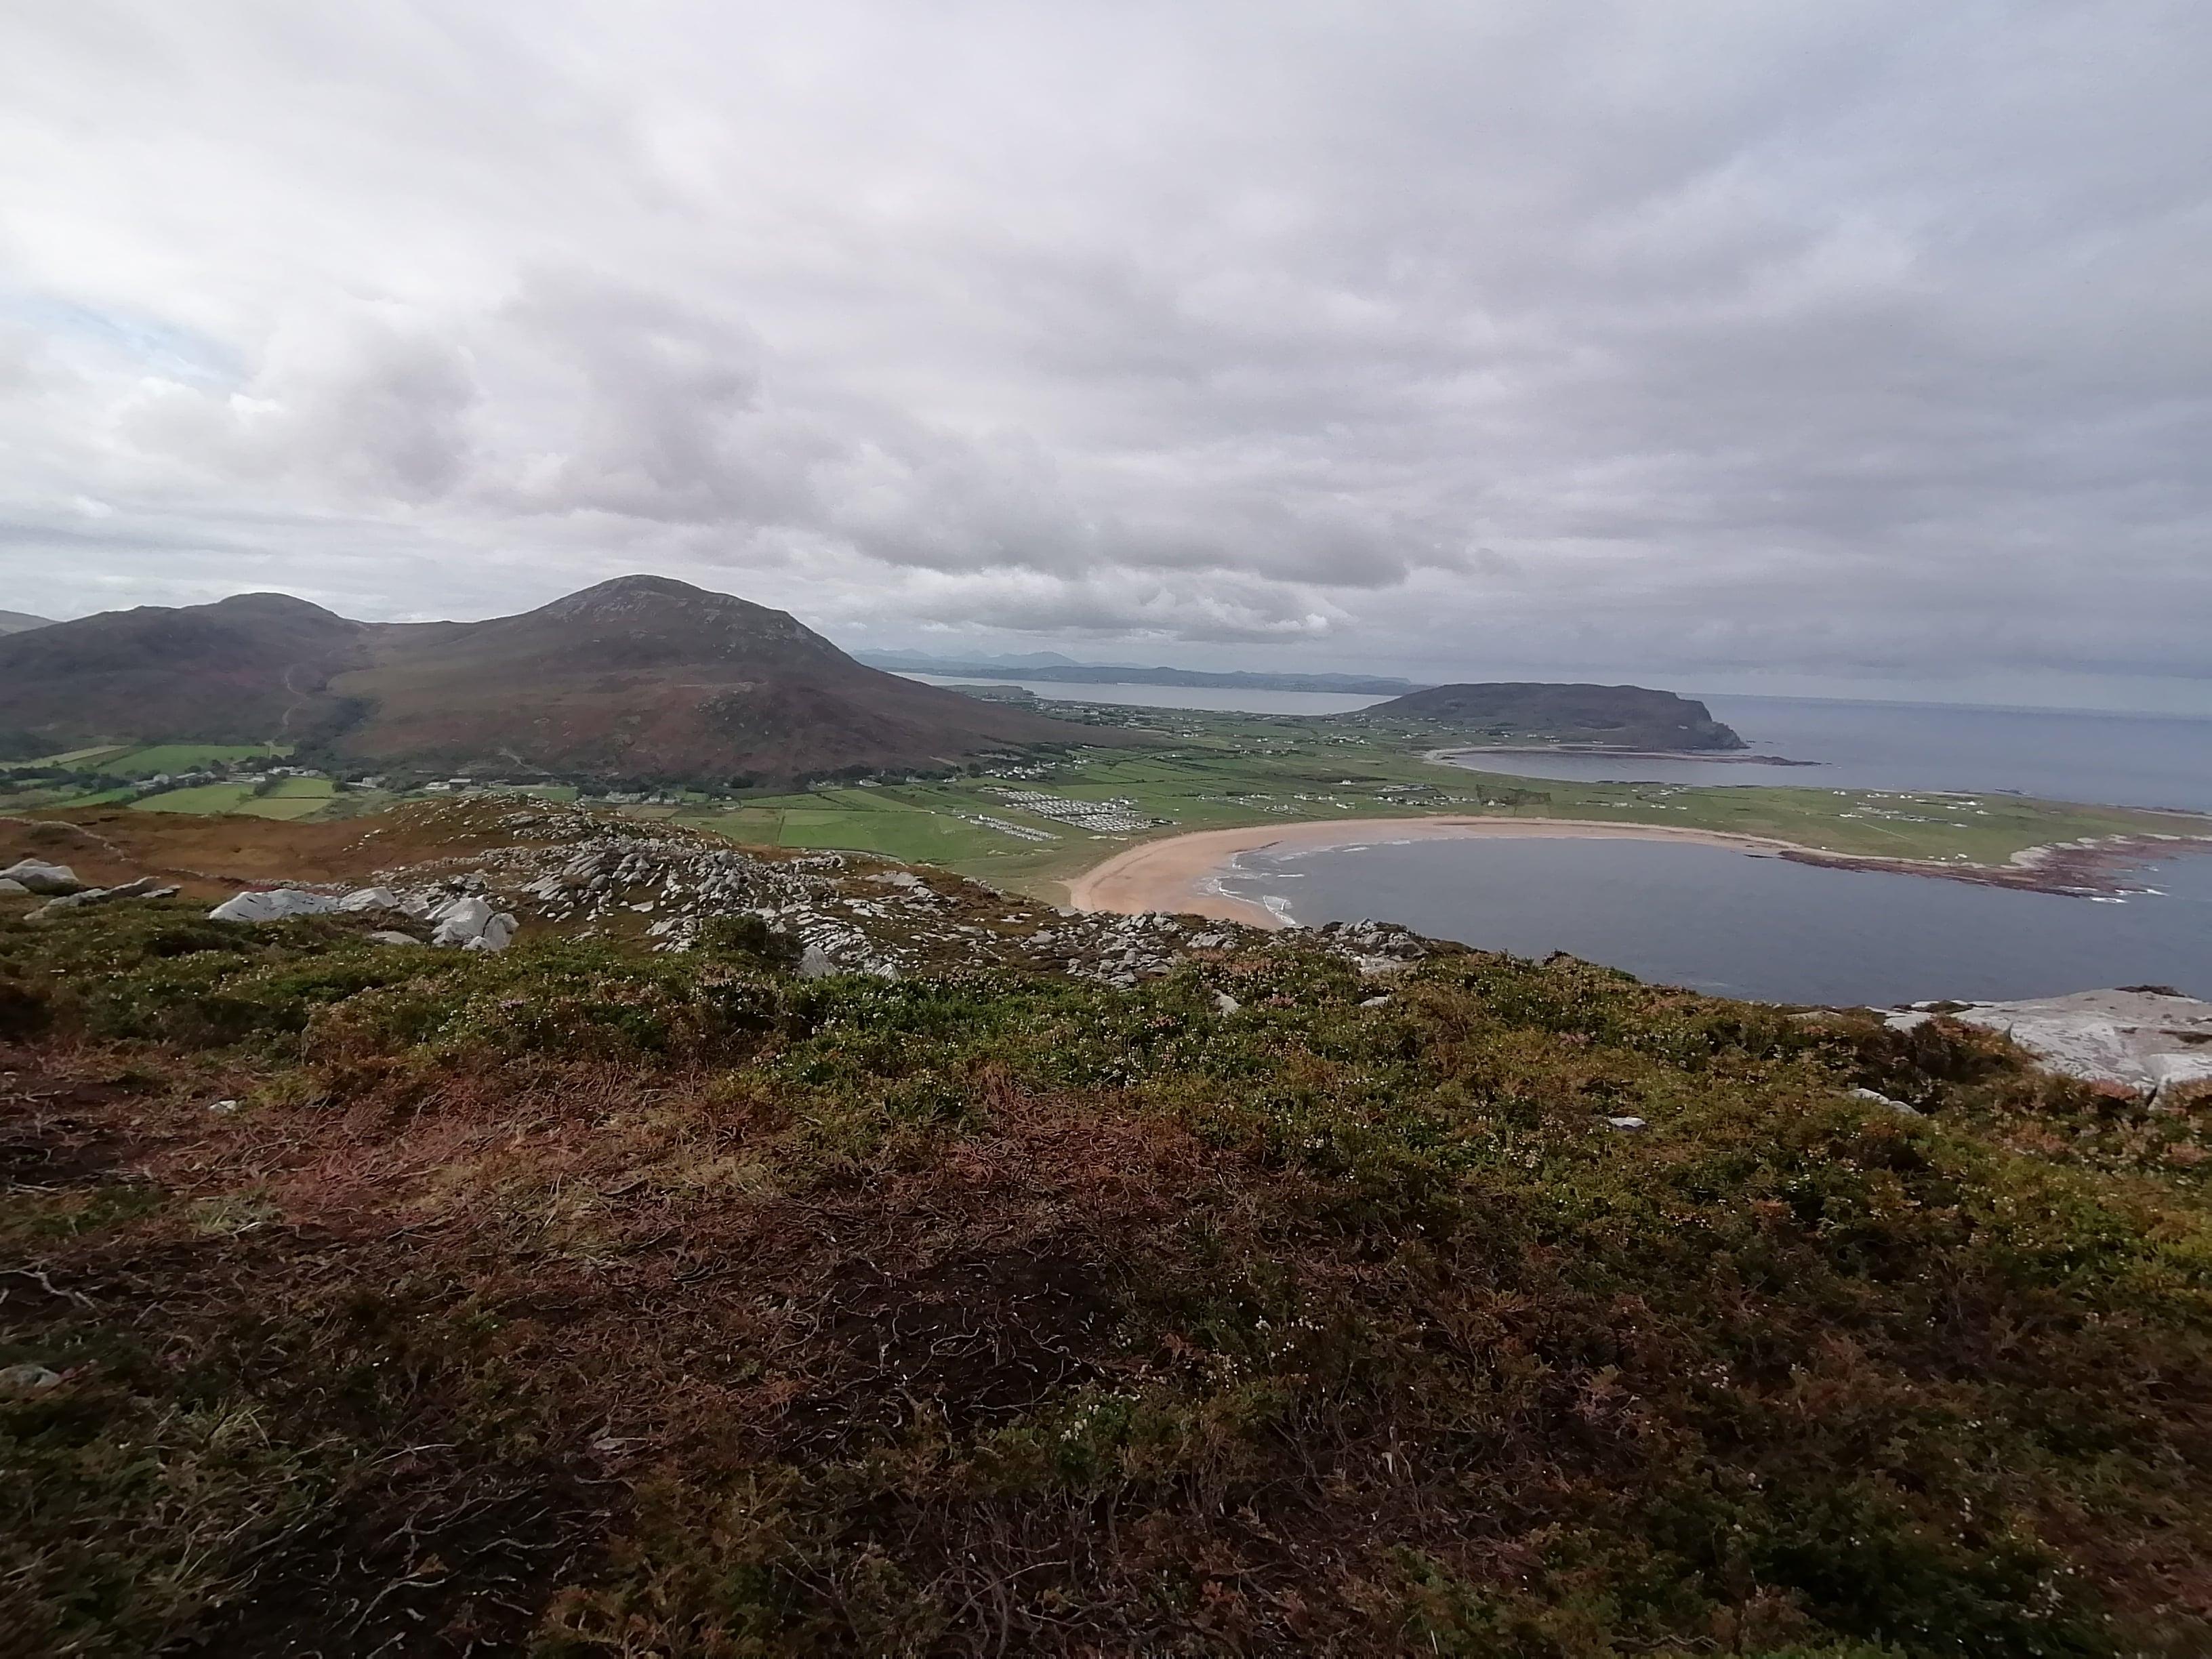 Binnion Hill